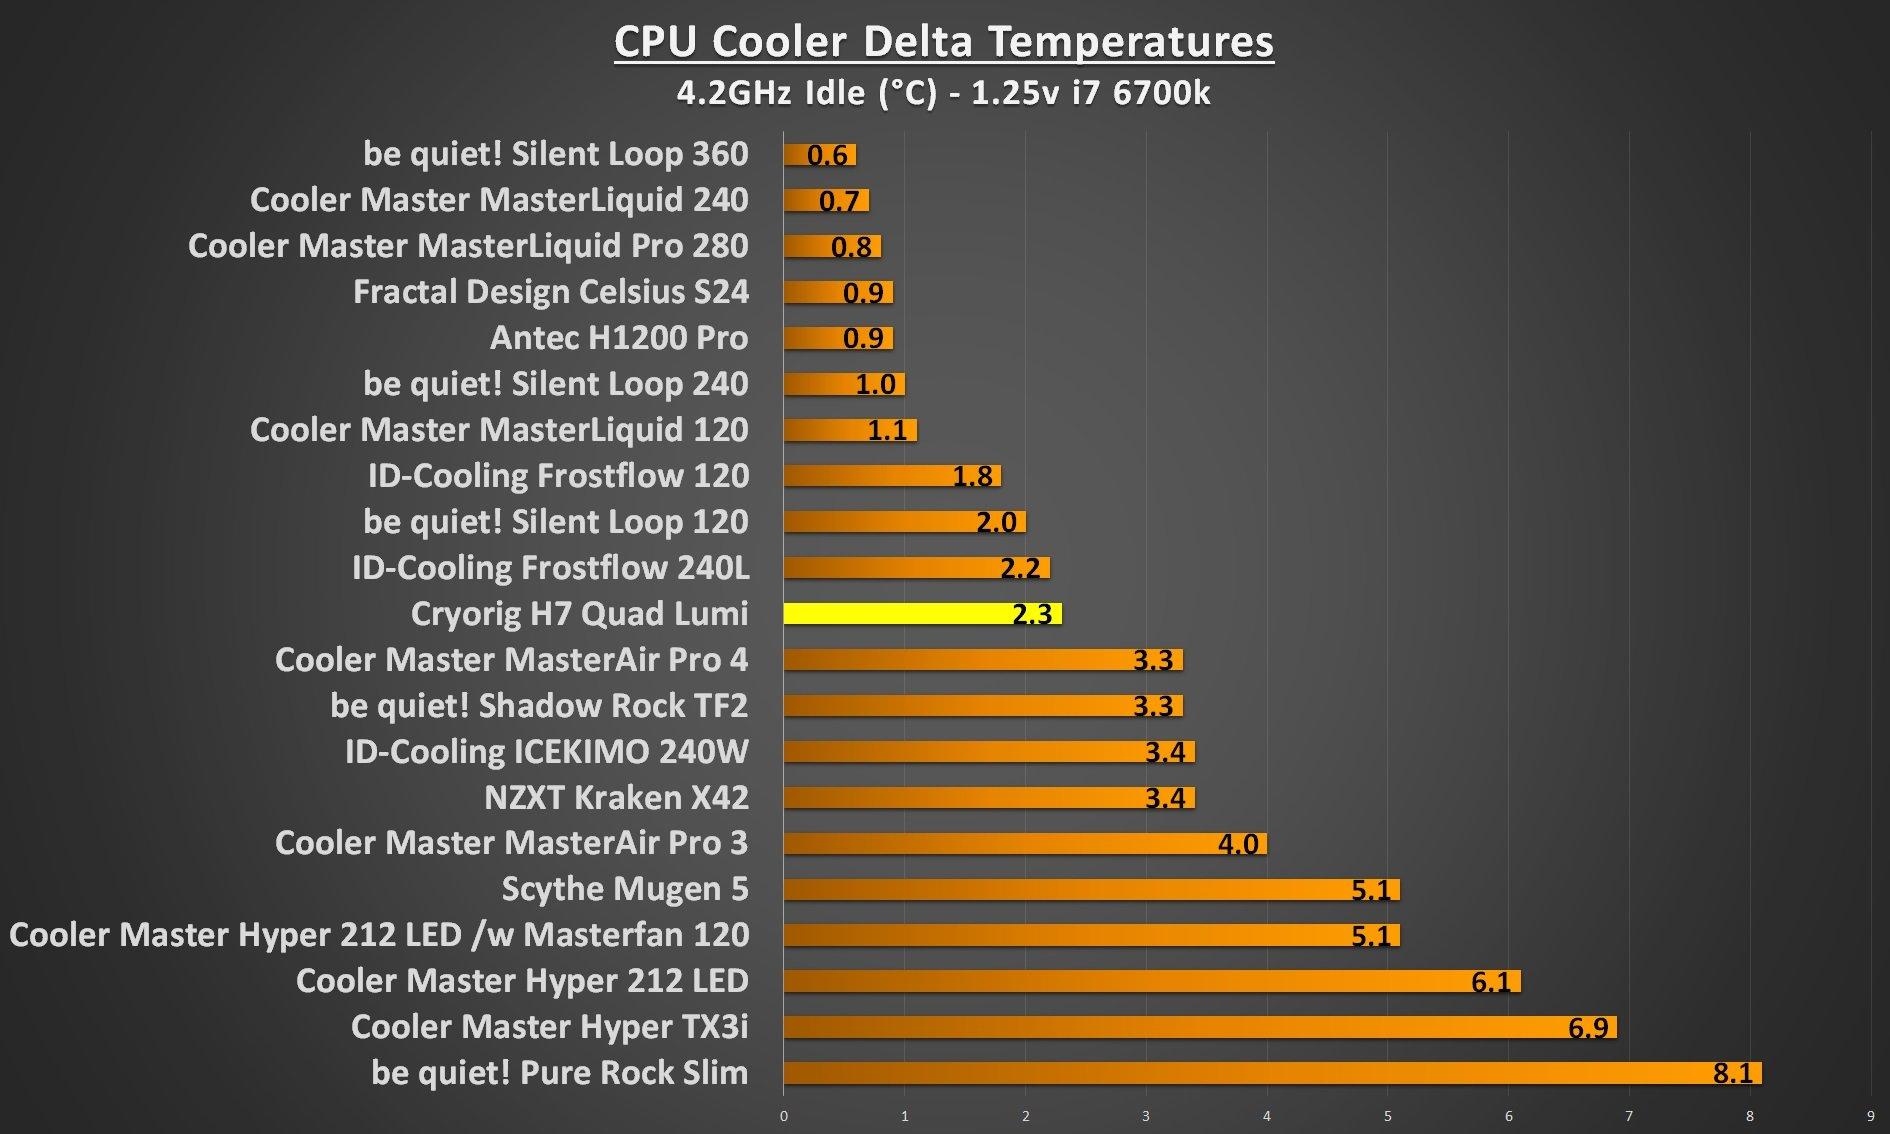 Cryorig H7 Quad Lumi 4.2Ghz idle